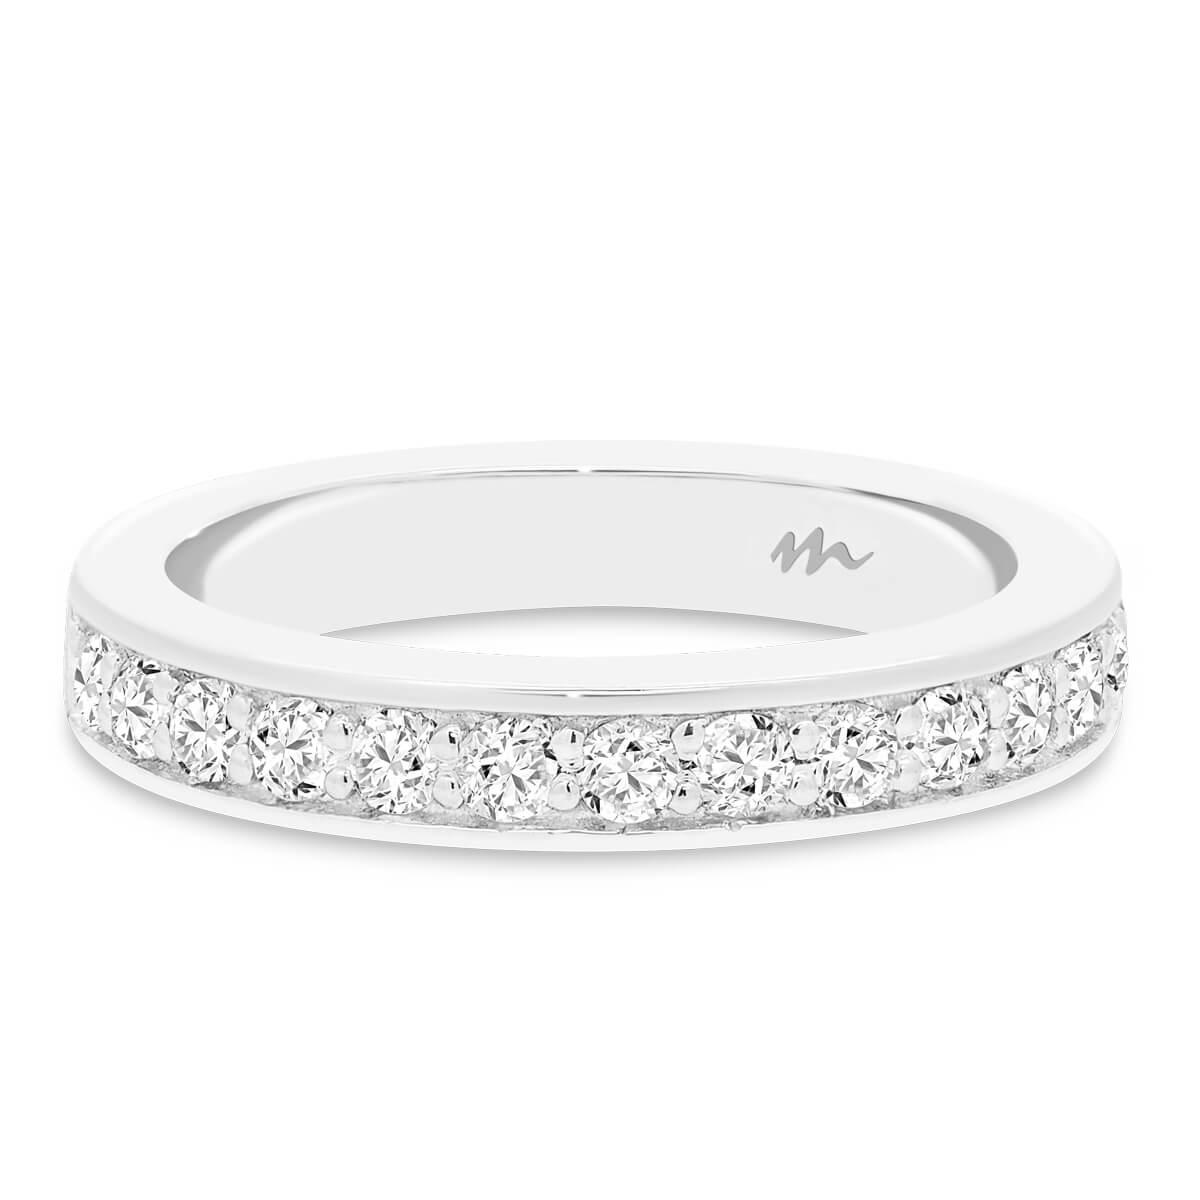 Millie 2.0 Pave set Moissanite wedding ring